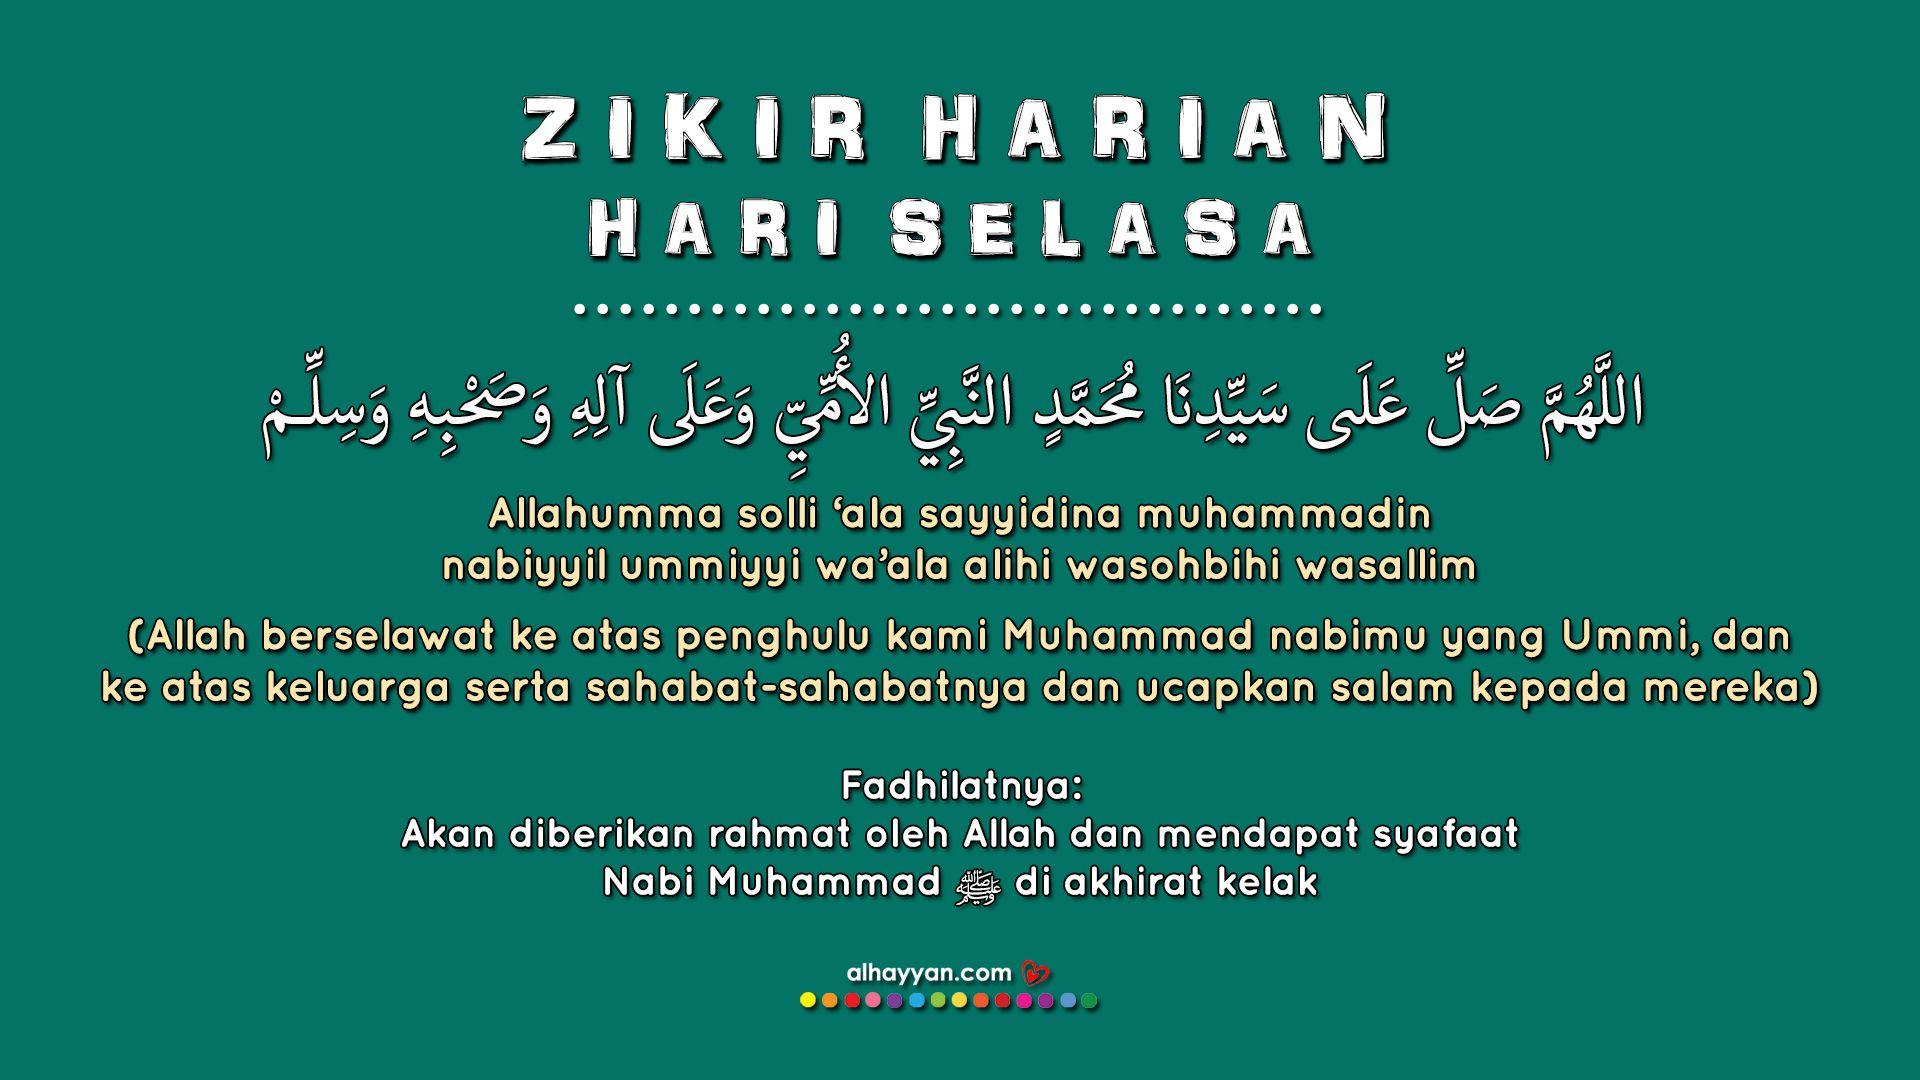 Zikir Harian Hari Selasa Islamic messages Doa Allah